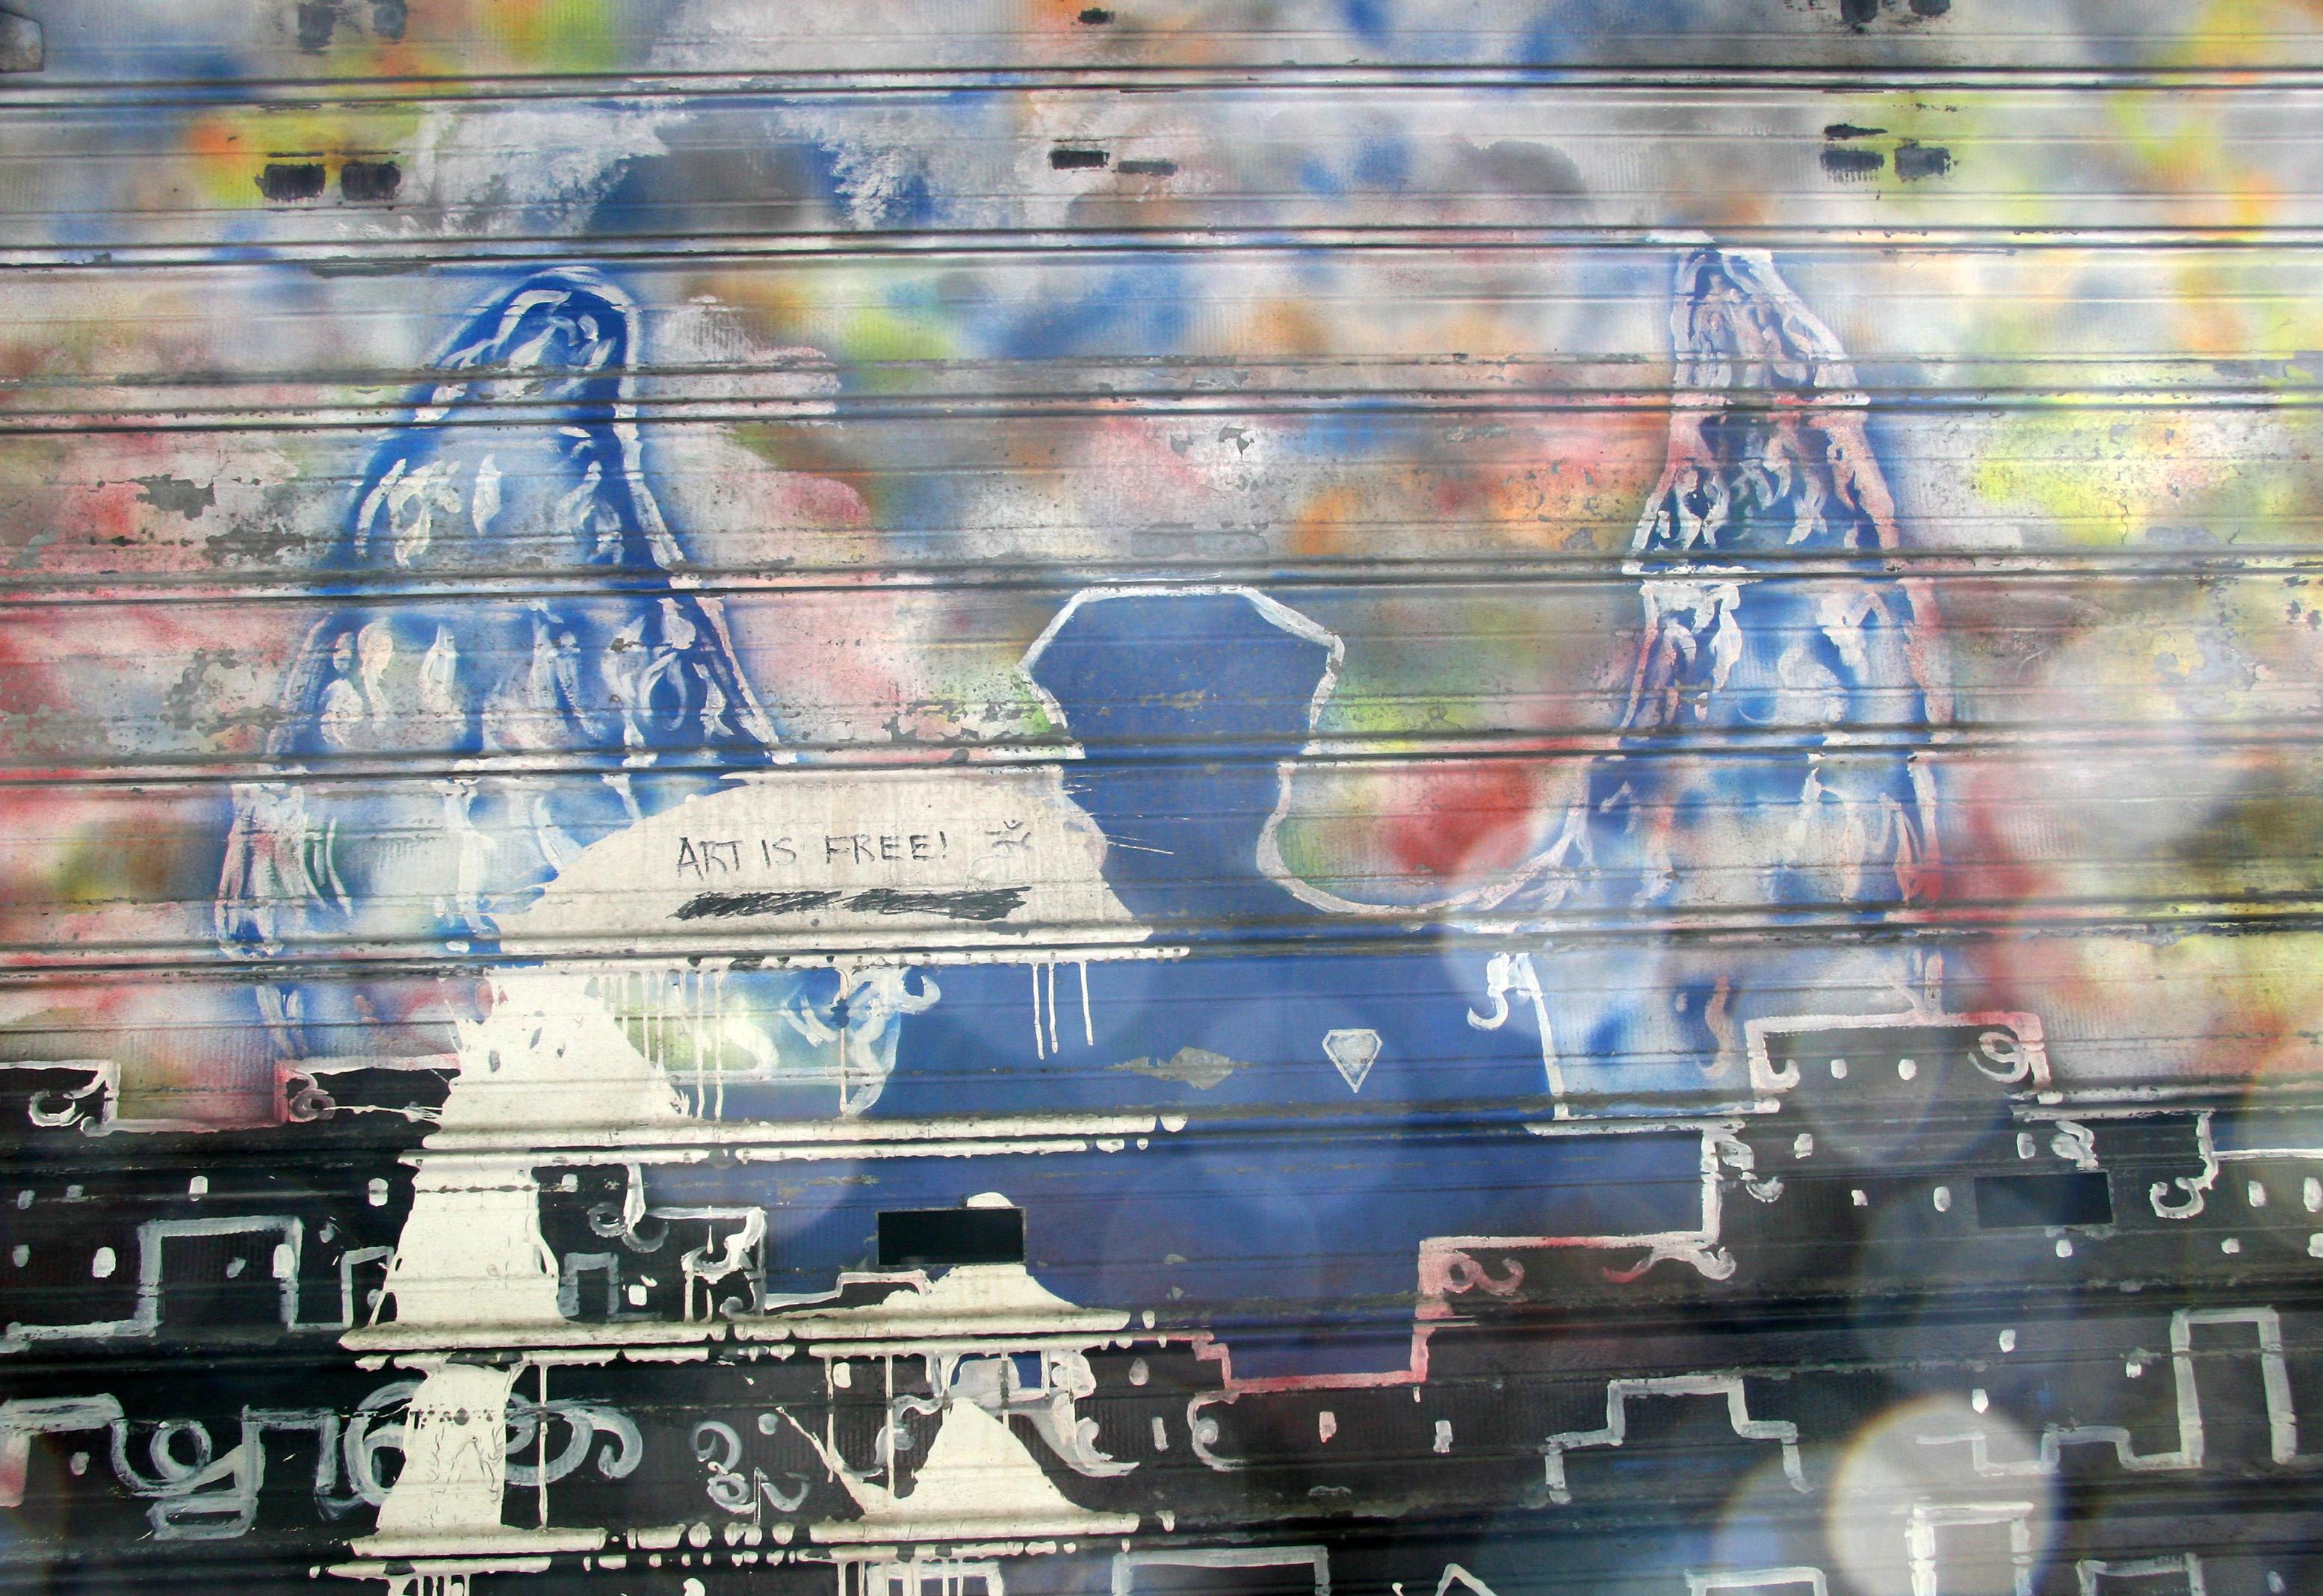 911 Mural on a Shop Window Metal Blind